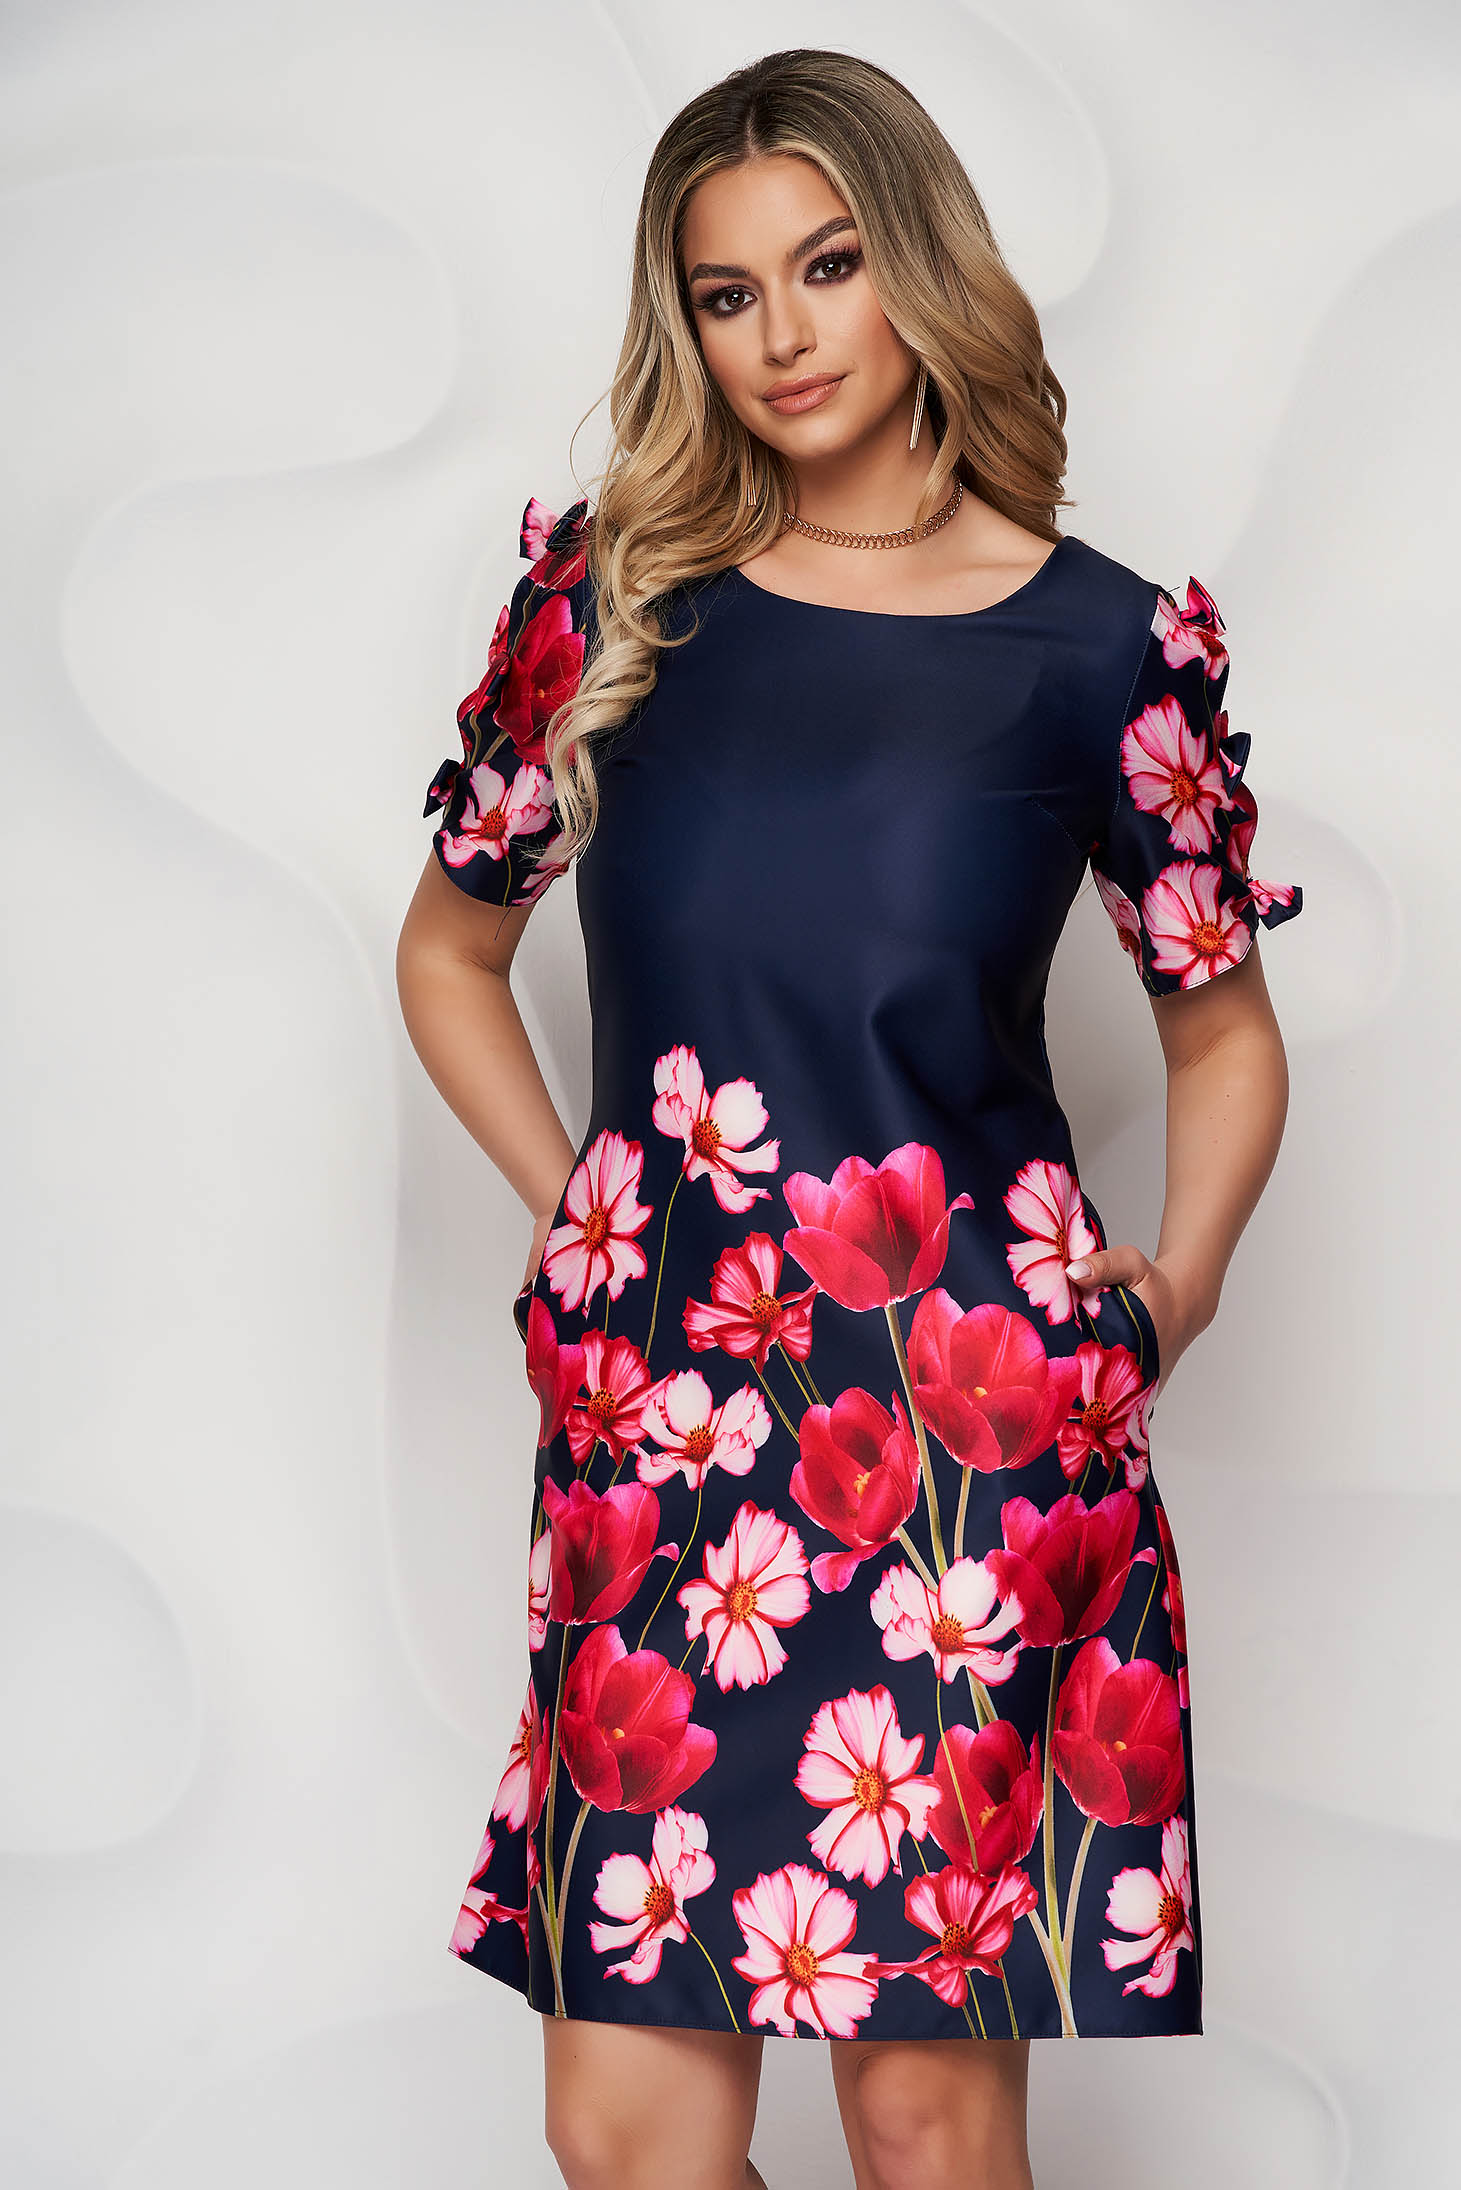 Darkblue dress